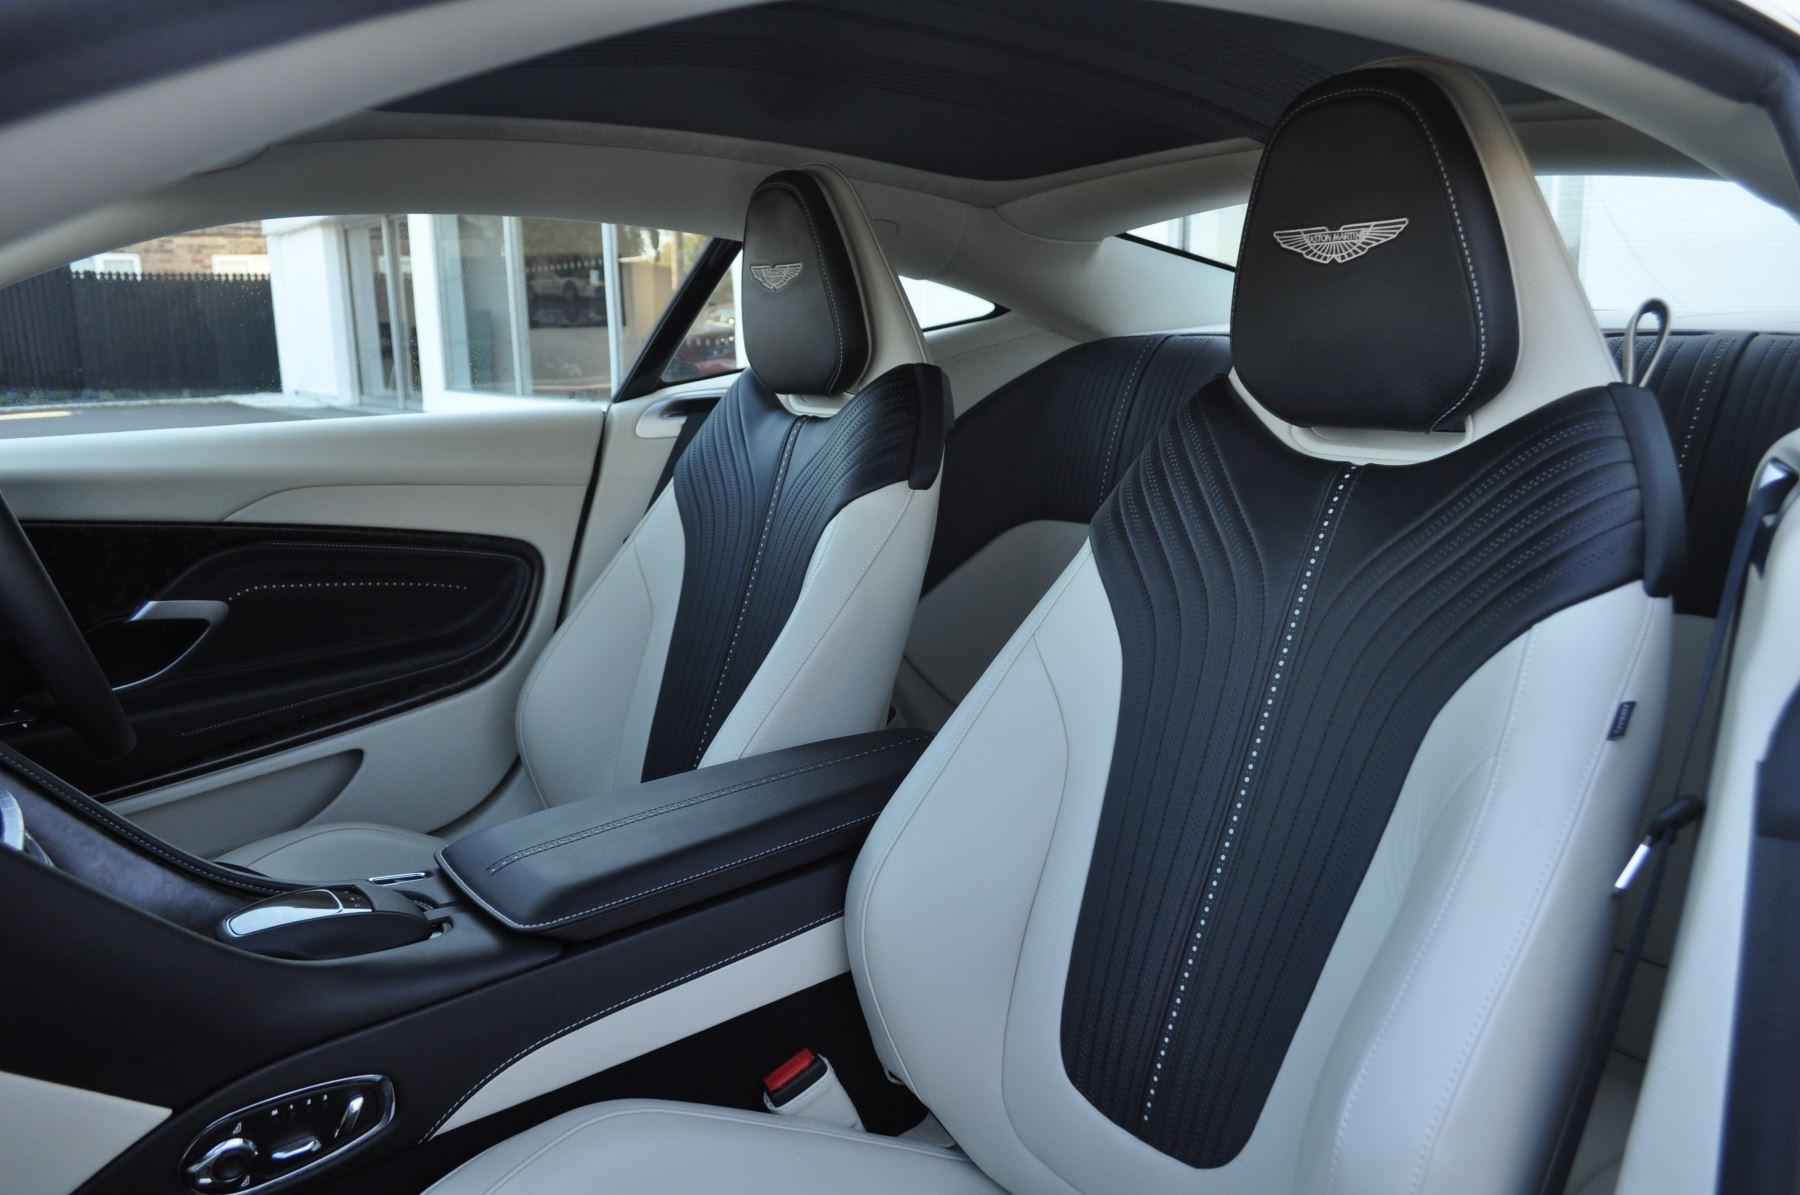 Aston Martin DB11 V12 2dr Touchtronic image 28